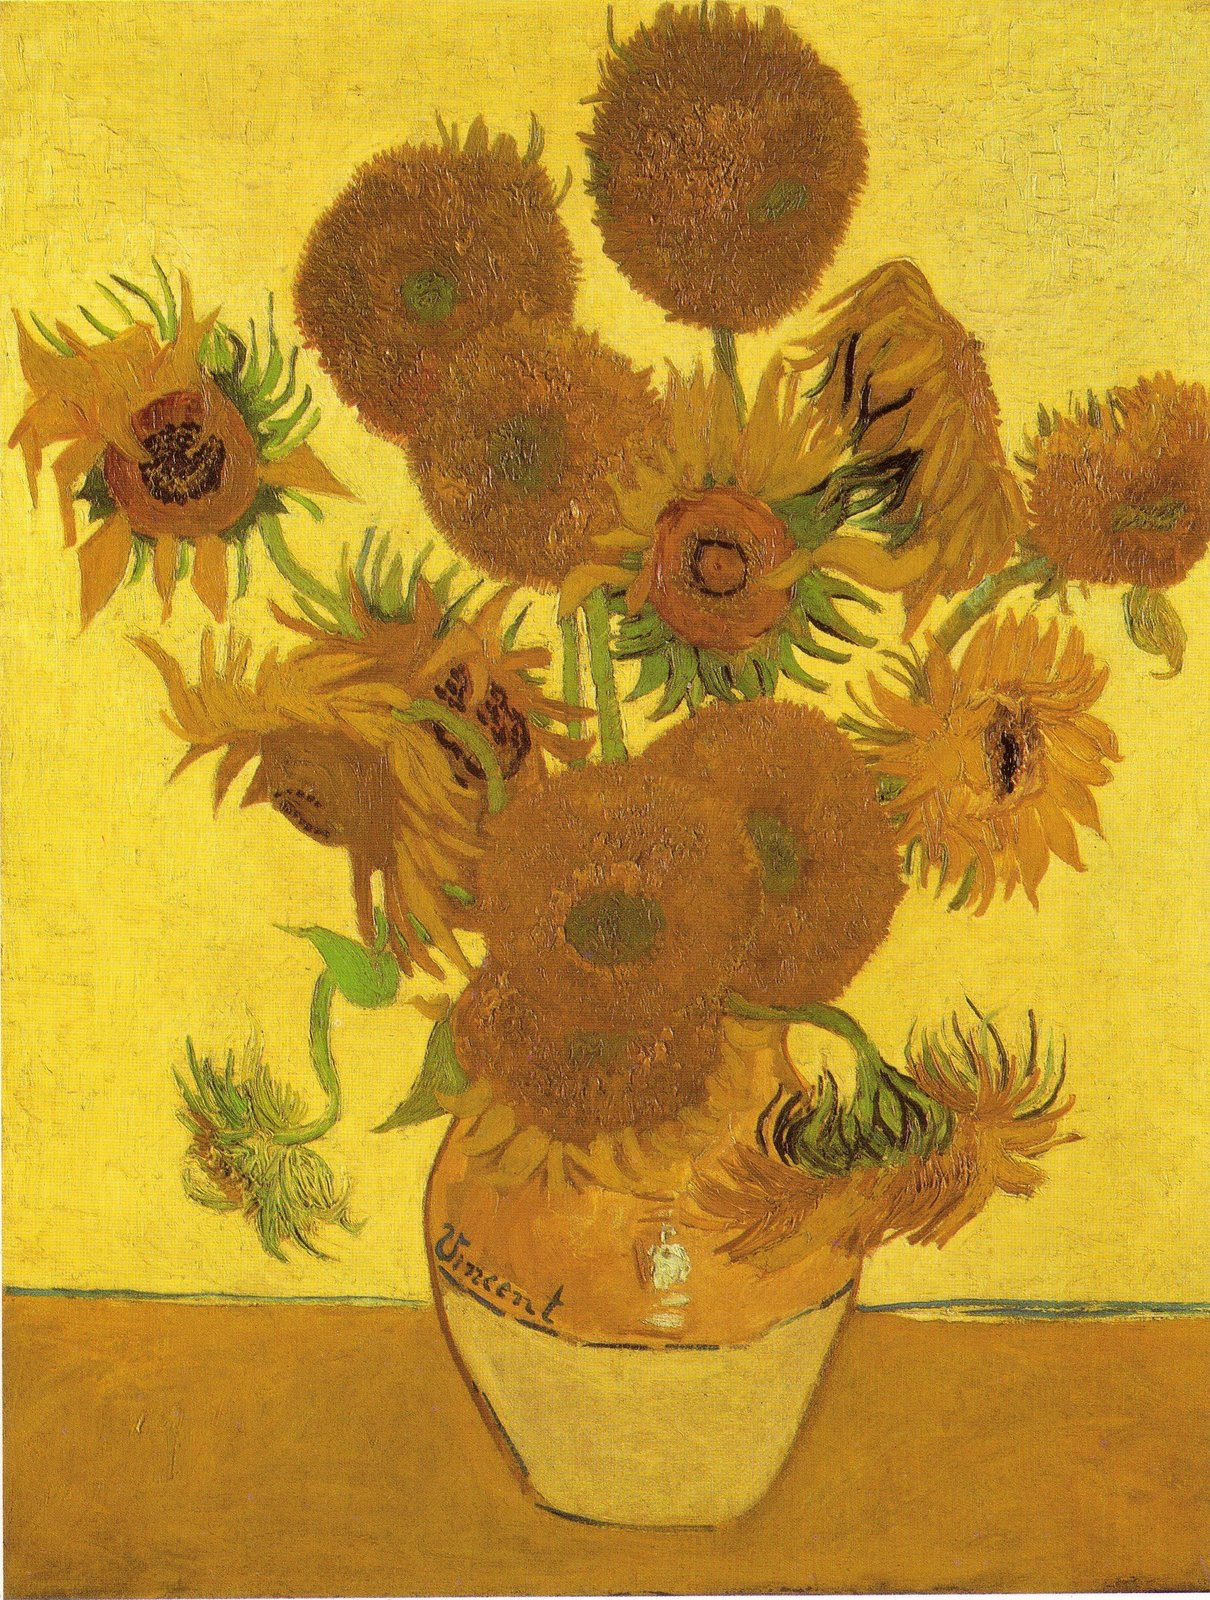 Famoso sauvage27: VASO CON I GIRASOLI (Sunflowers) - Vincent Van Gogh UK96